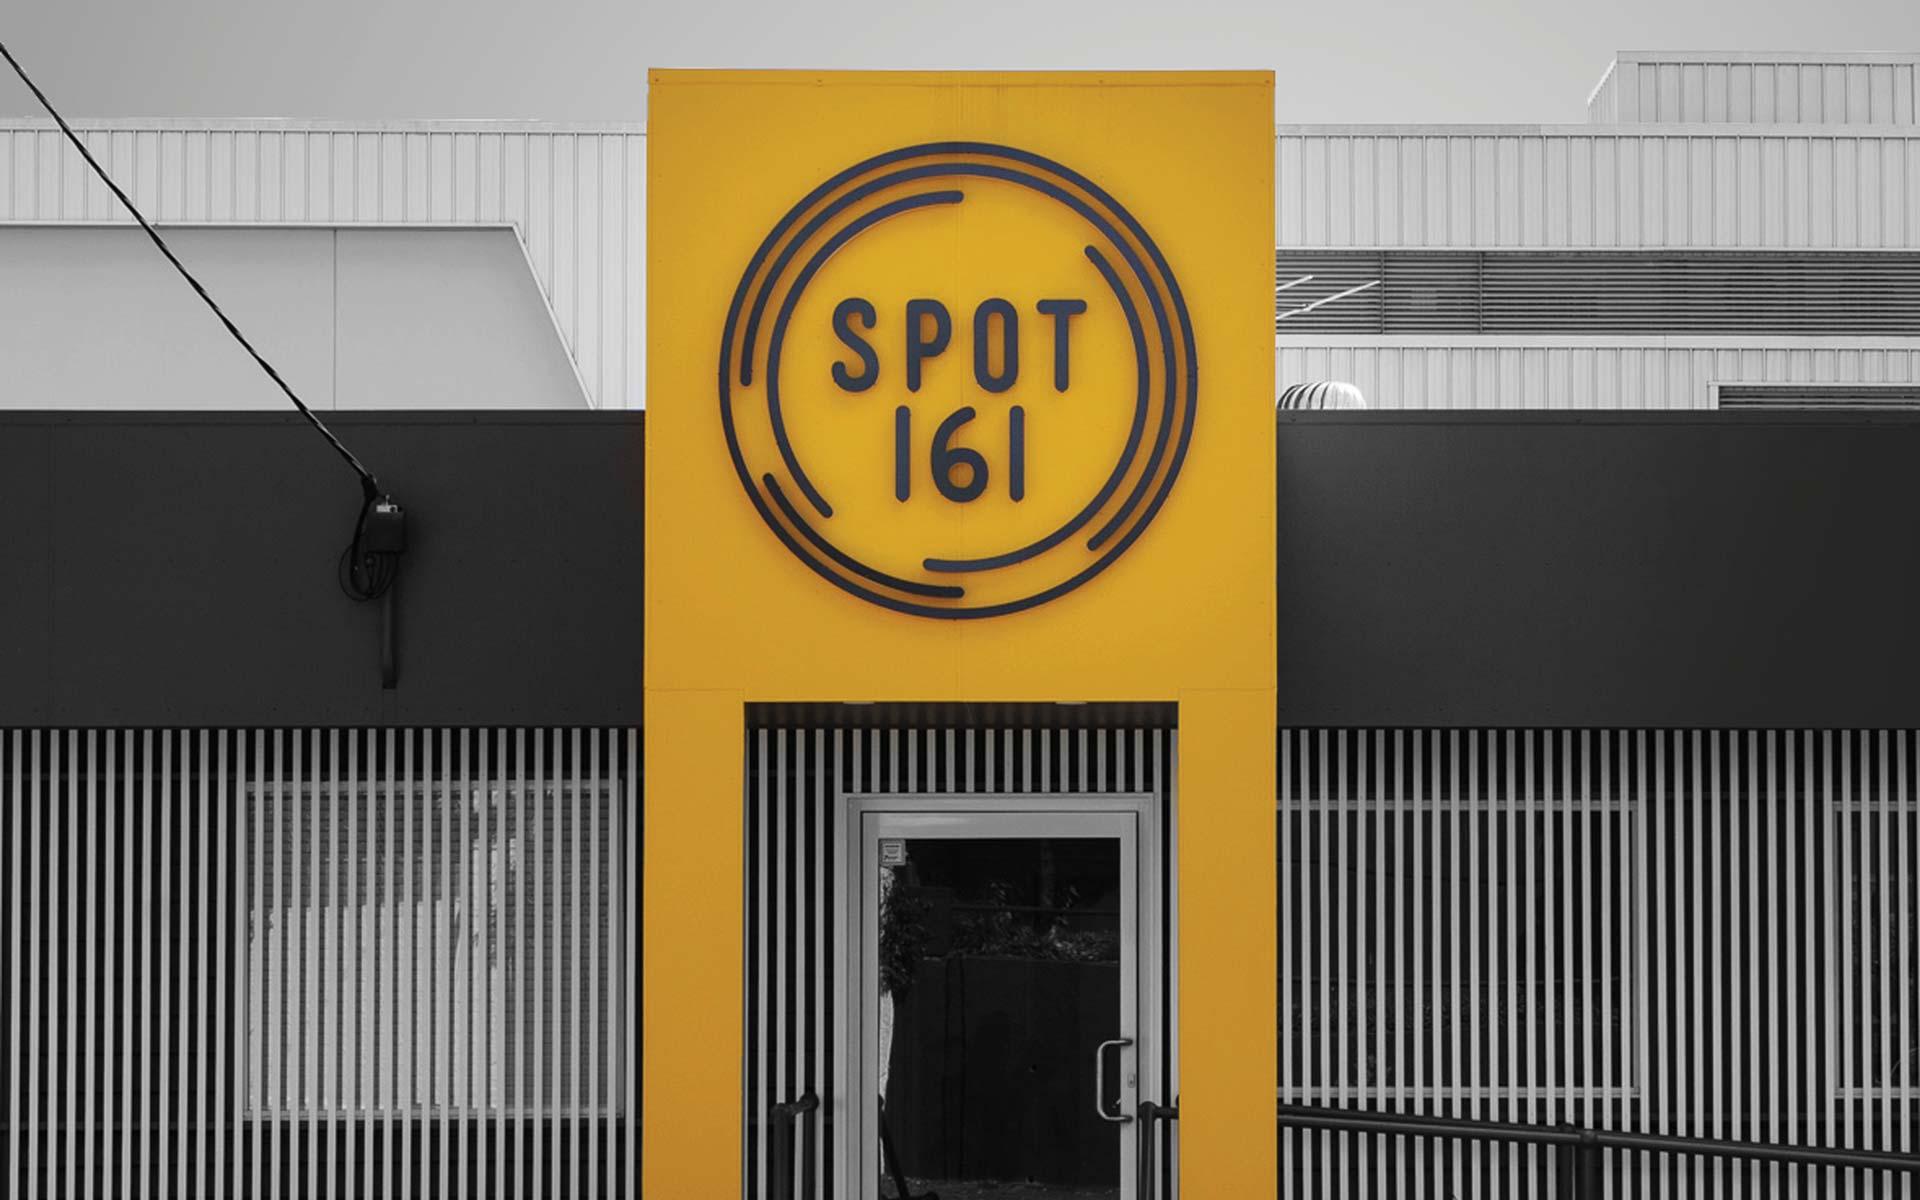 spot 161 signage design building graphics design bright yellow. Black Bedroom Furniture Sets. Home Design Ideas